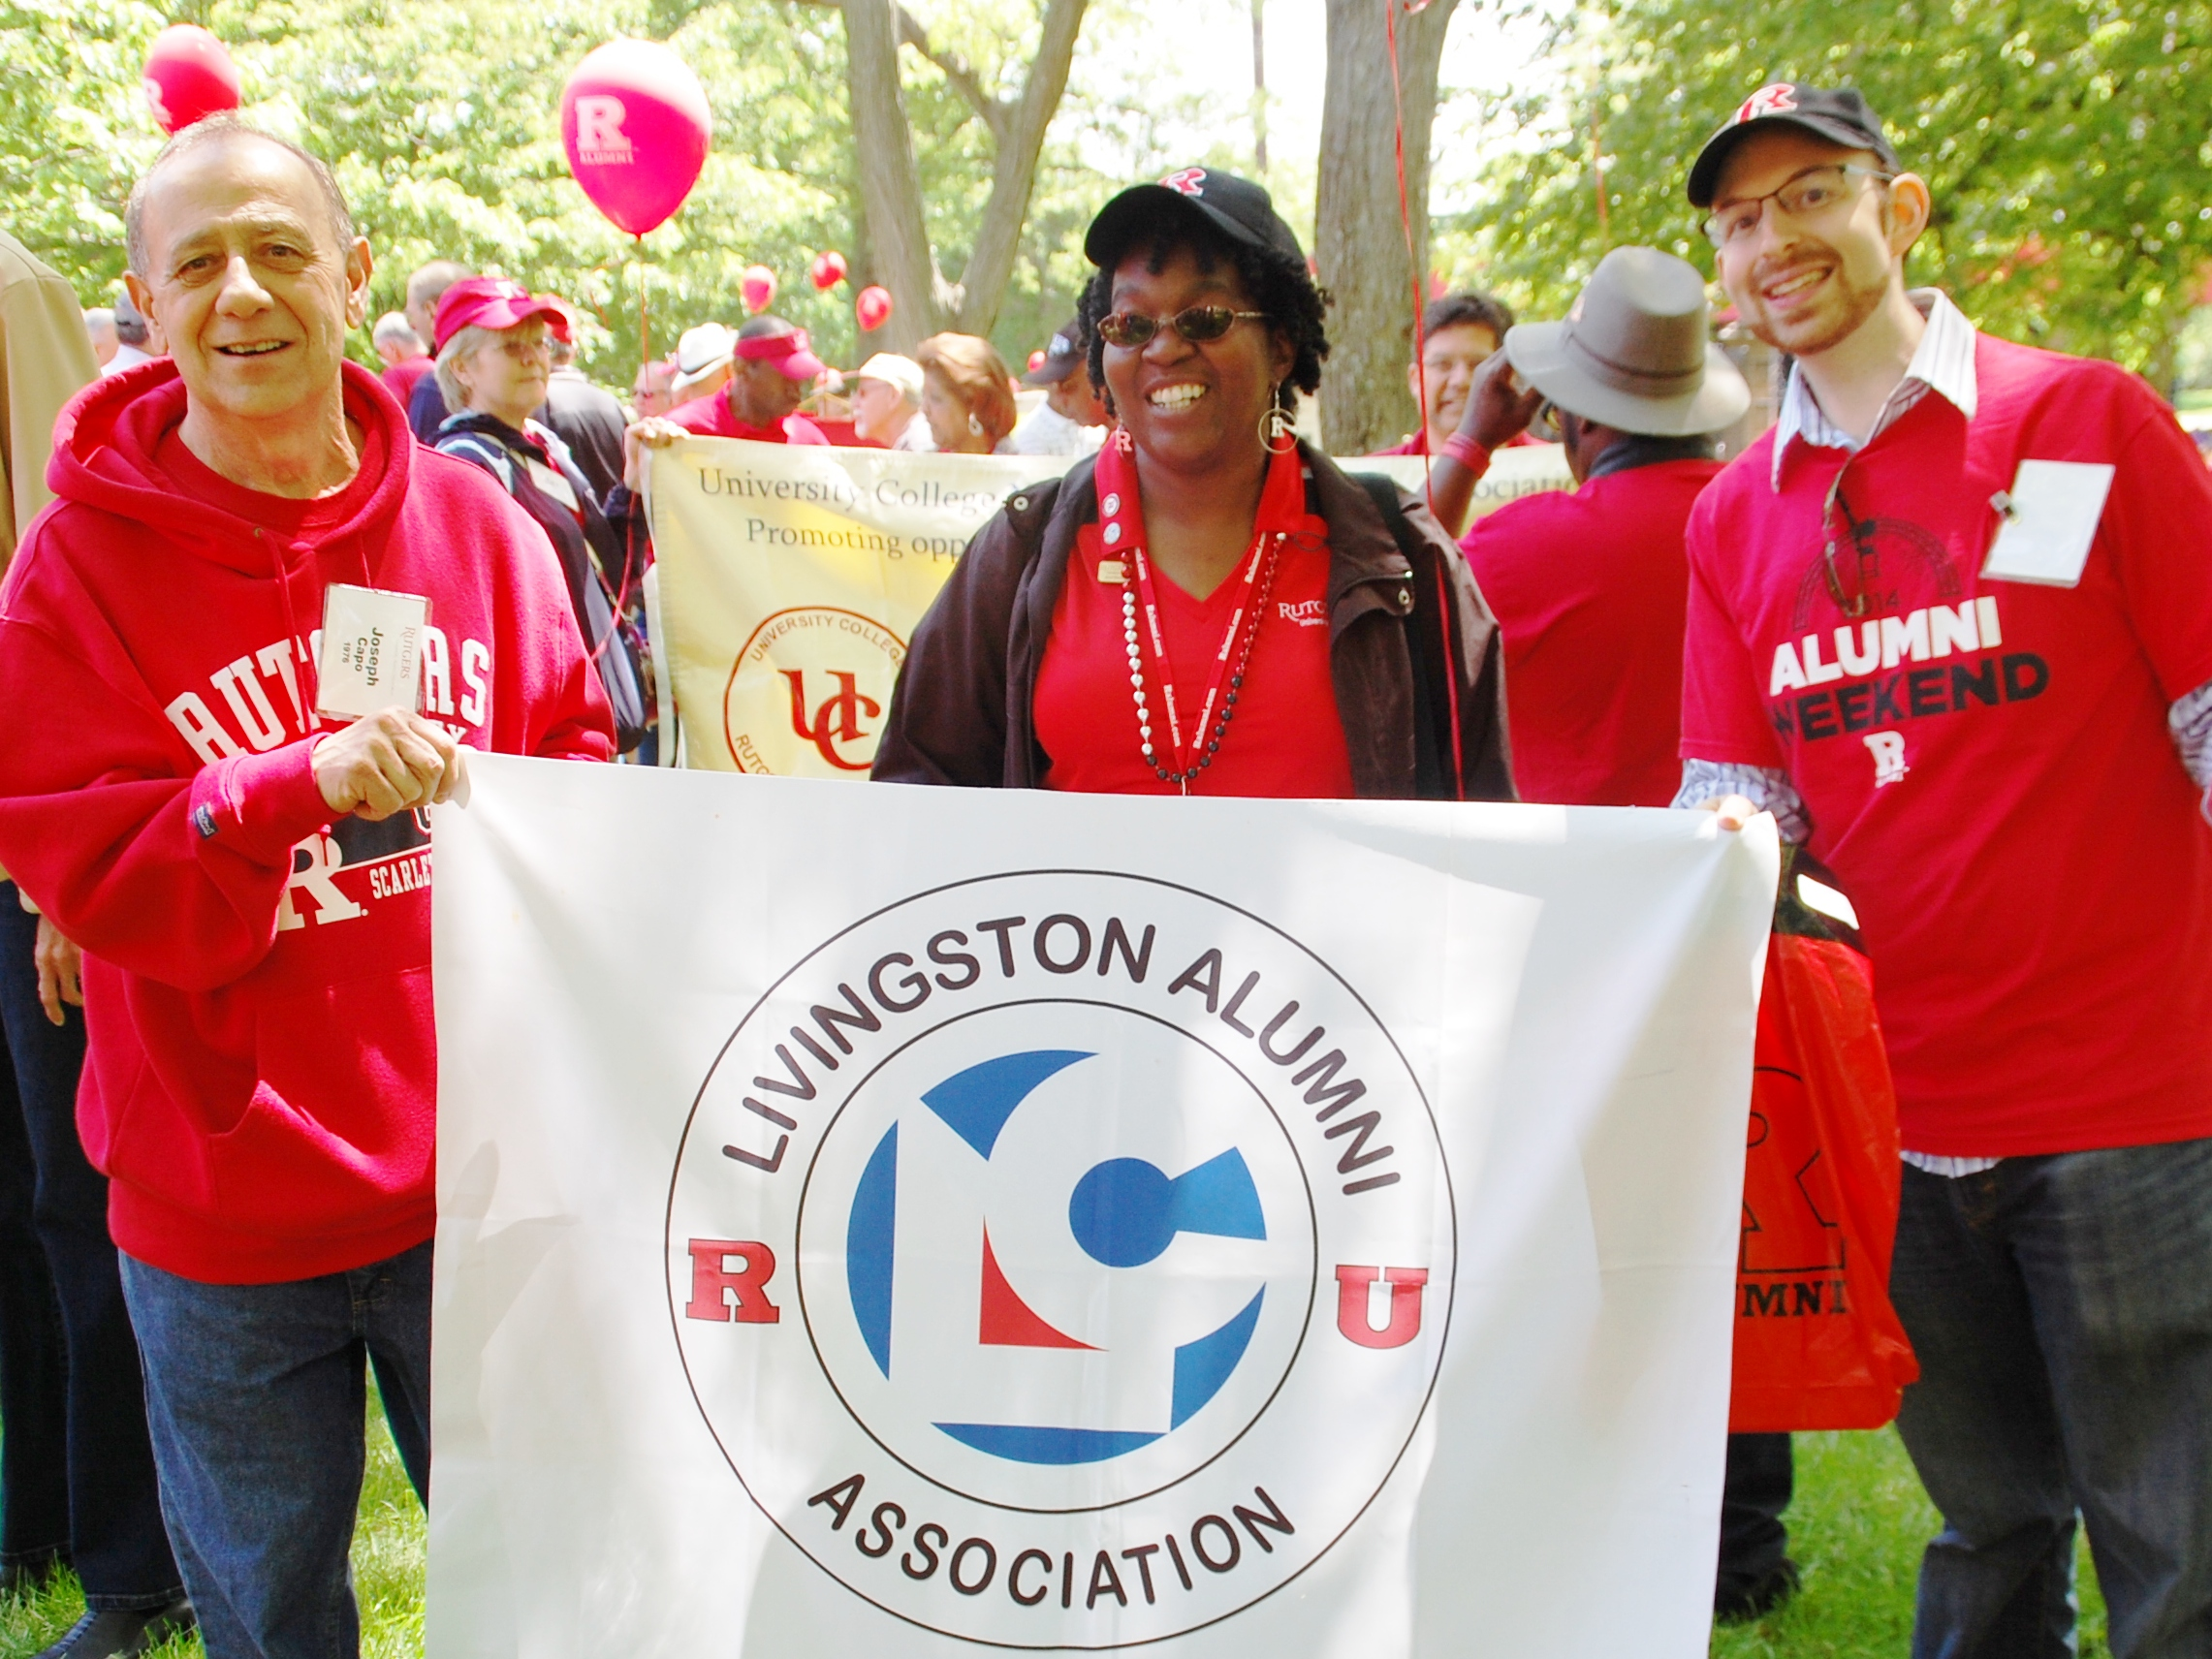 Joe Capo, Debra O'Neal and Jason Goldstein. Rutgers University Alumni Weekend (Reunion) 2014. Livingston College